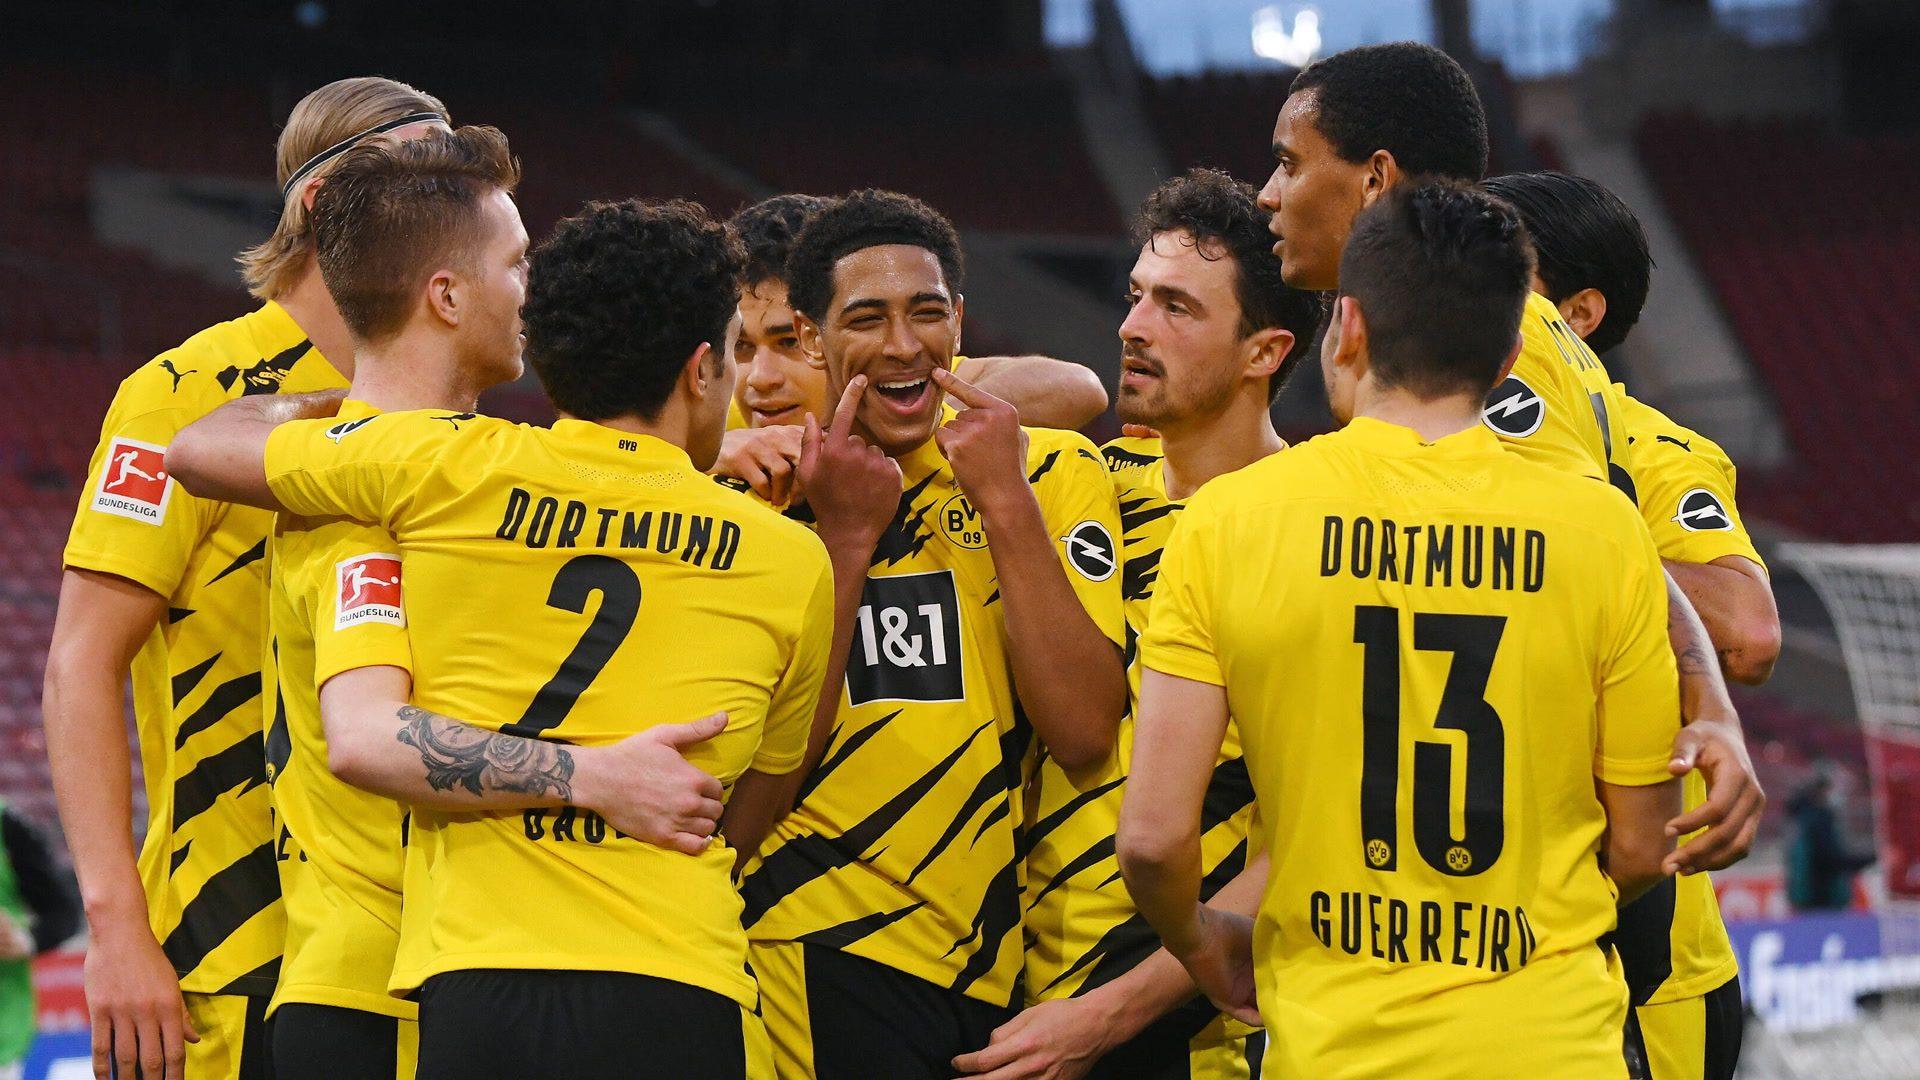 Bellingham and Knauff help Dortmund beat Stuttgart